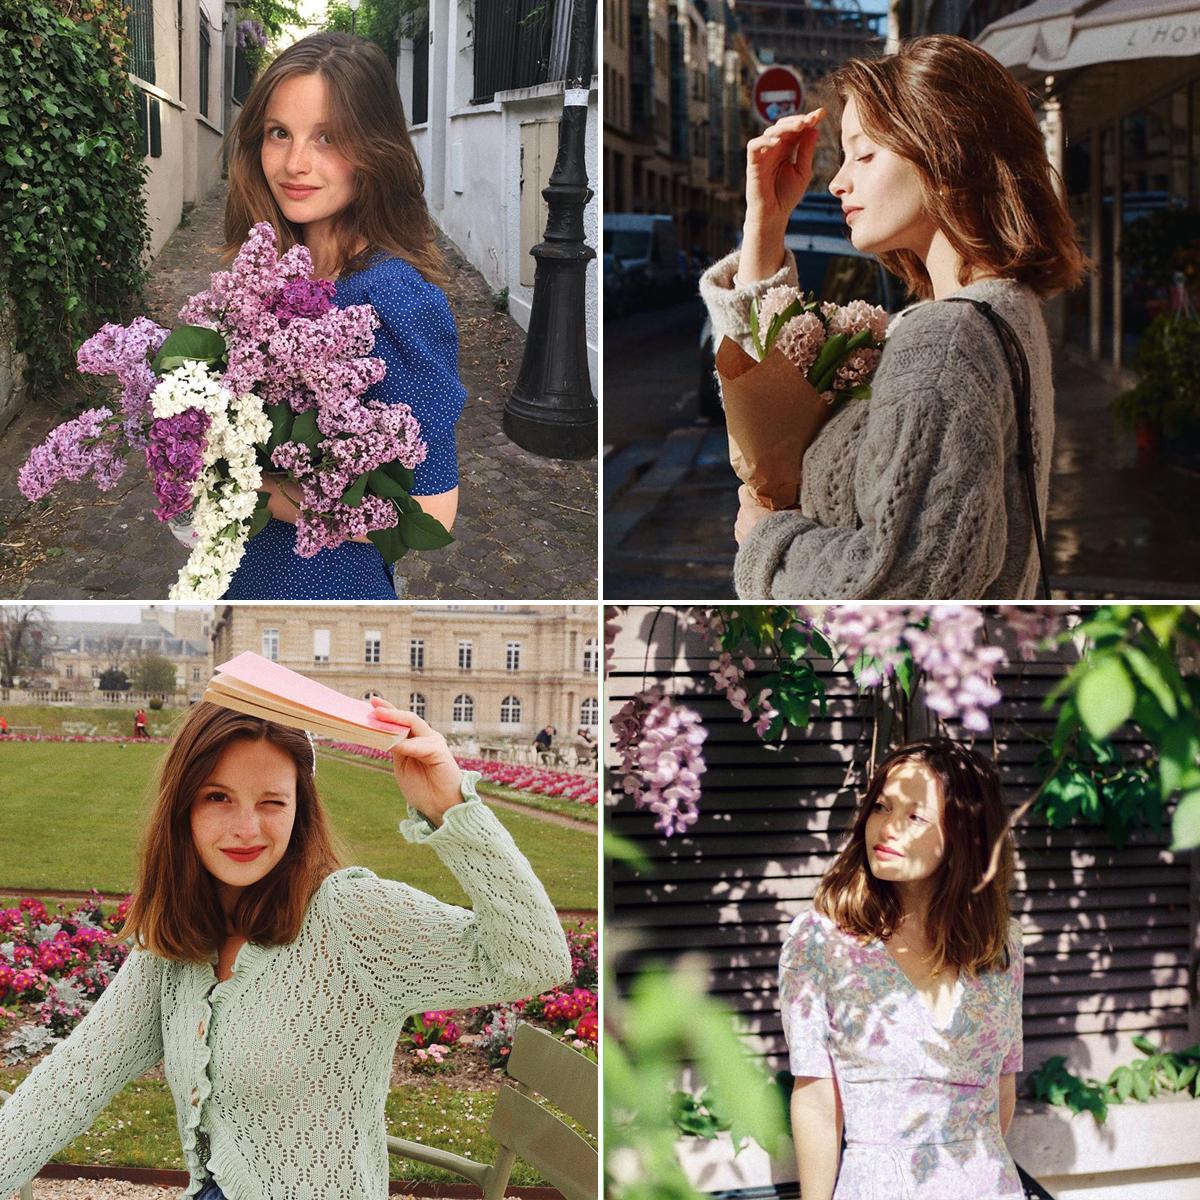 Phong cách thời trang Pháp của Camille Yolaine